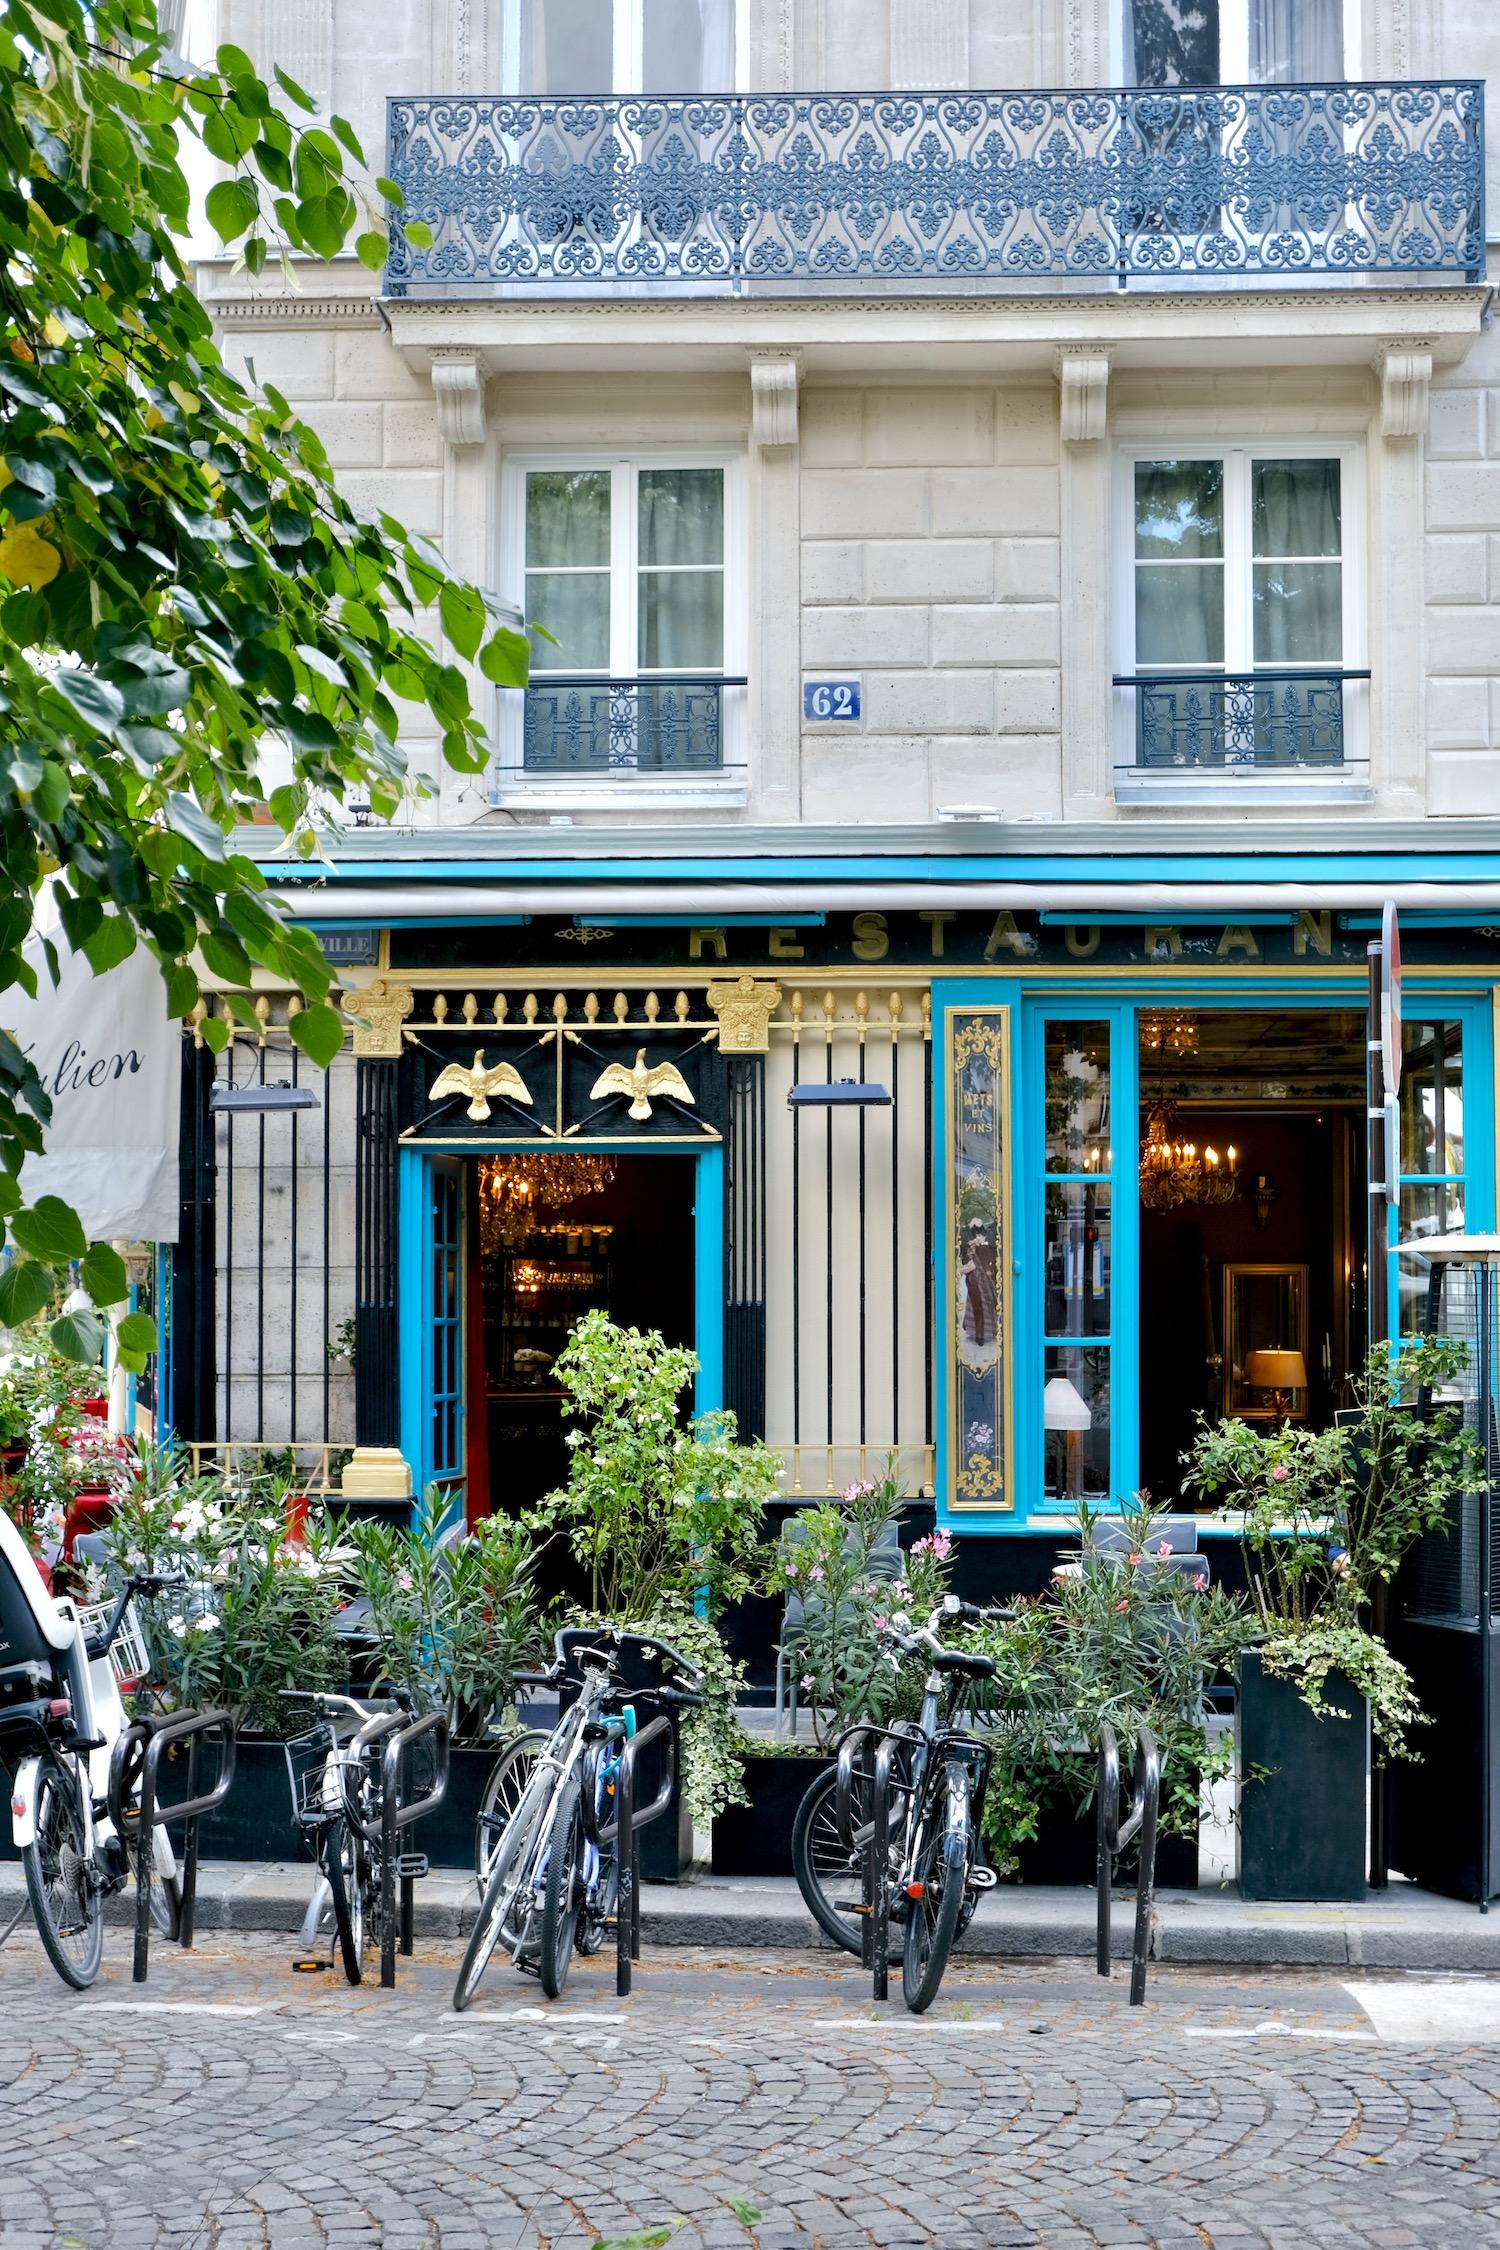 Falling back in love with Paris Chez Julien